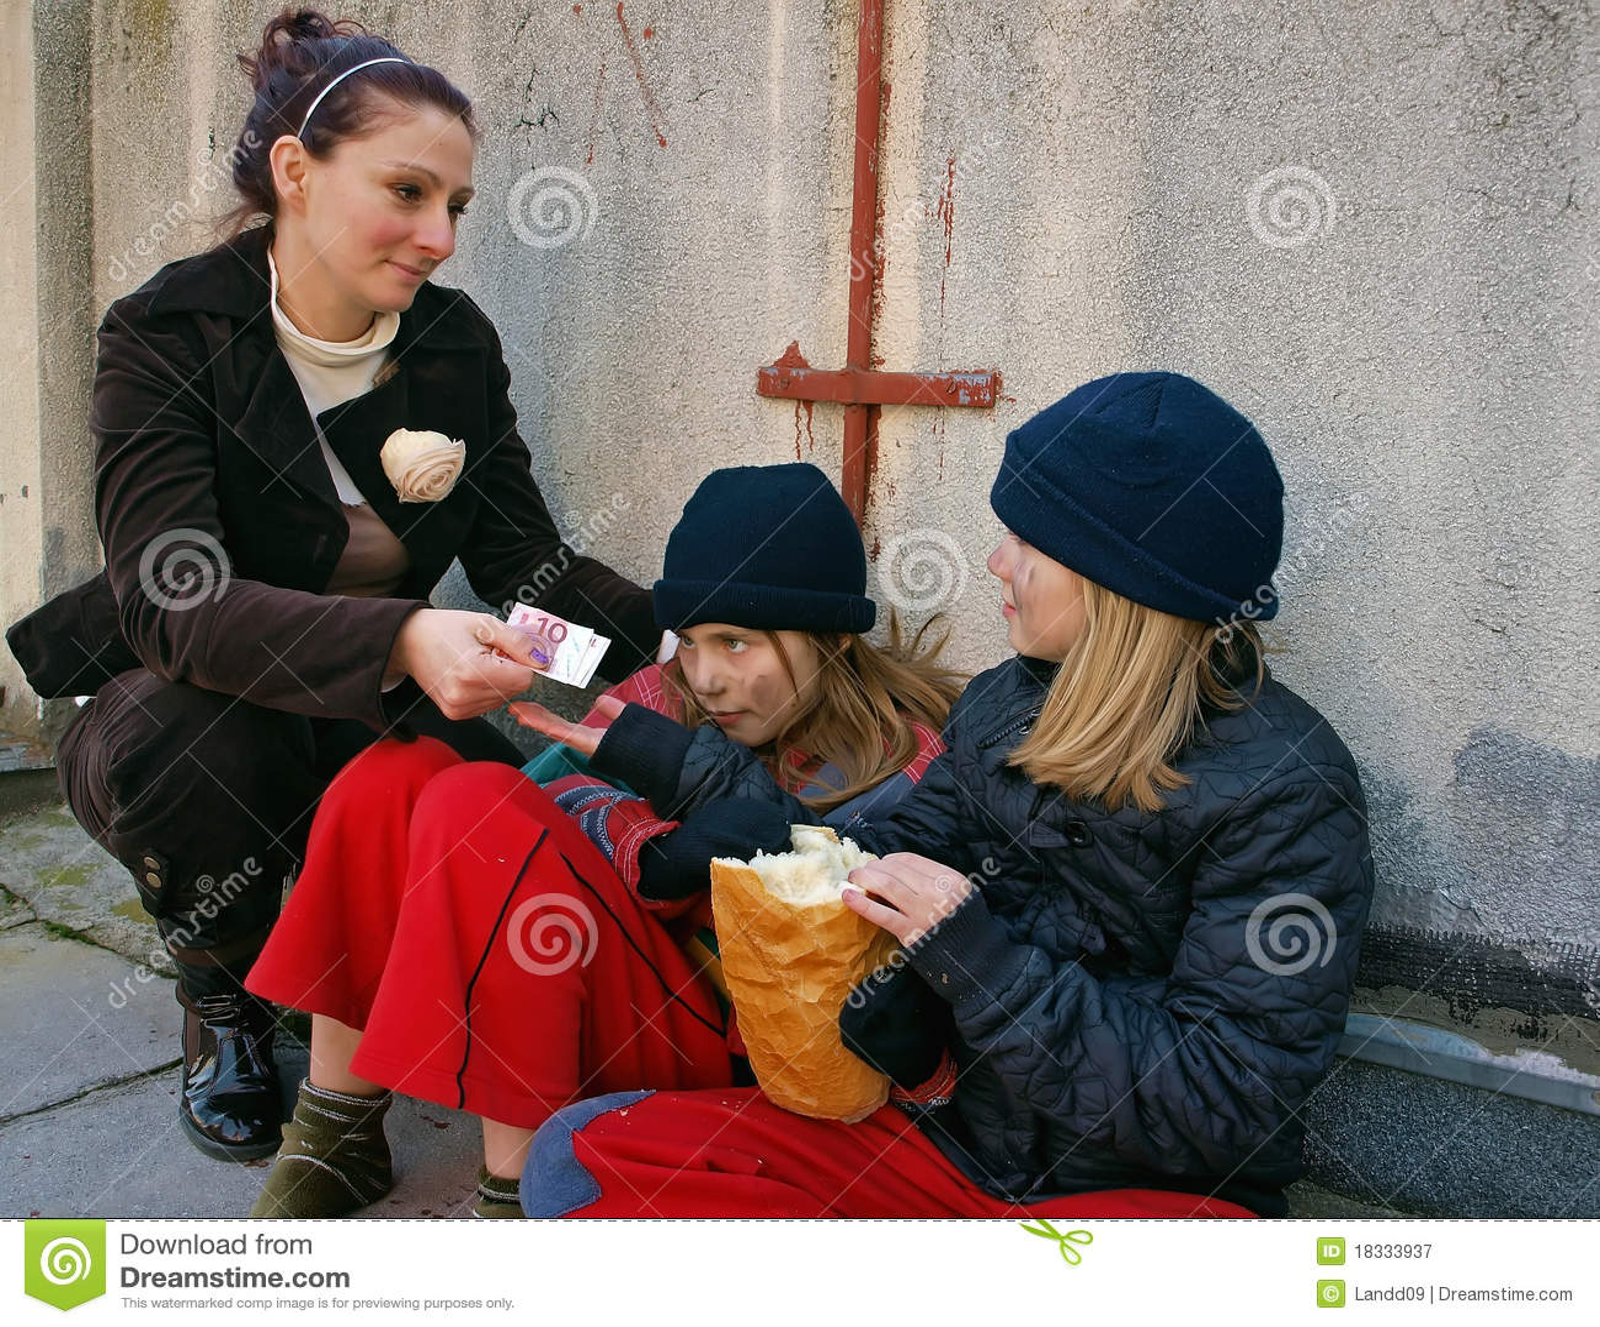 Beggar Ticks, Bur Marigold Tea, Water Therapy & Diet Heals Diabetes